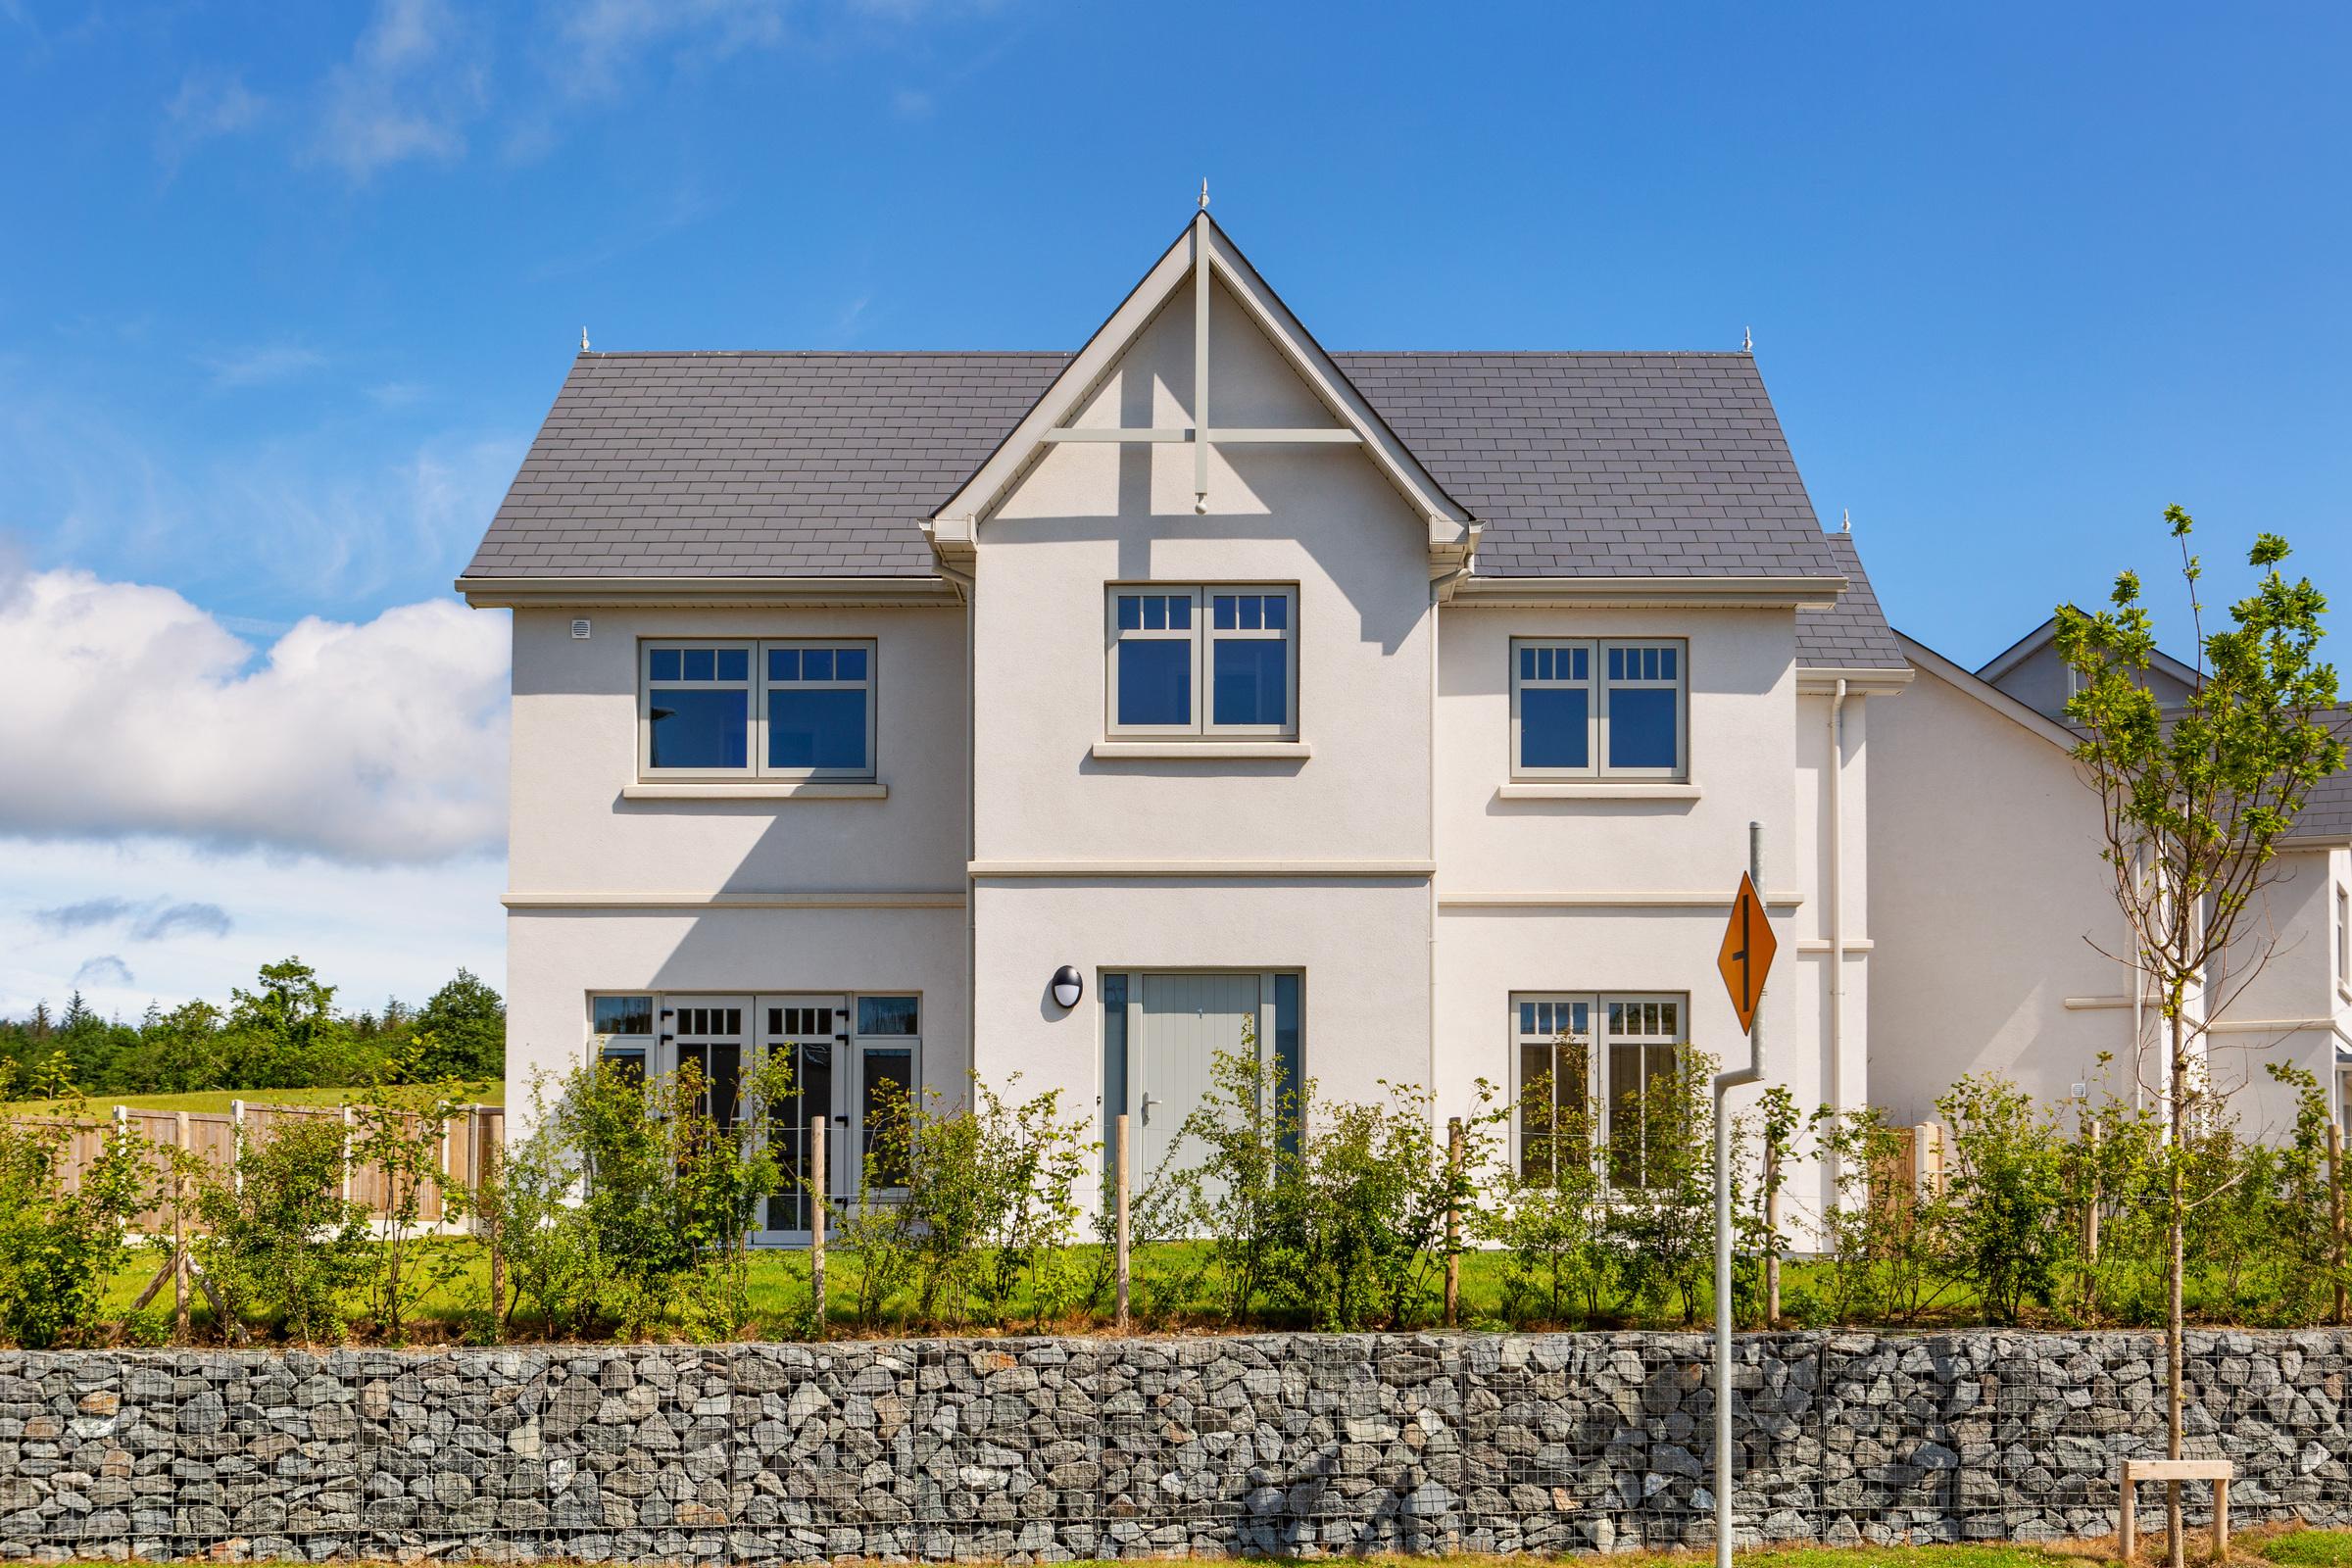 4 Bedroom Detached House, Ballinahinch Wood, Ashford, Co. Wicklow